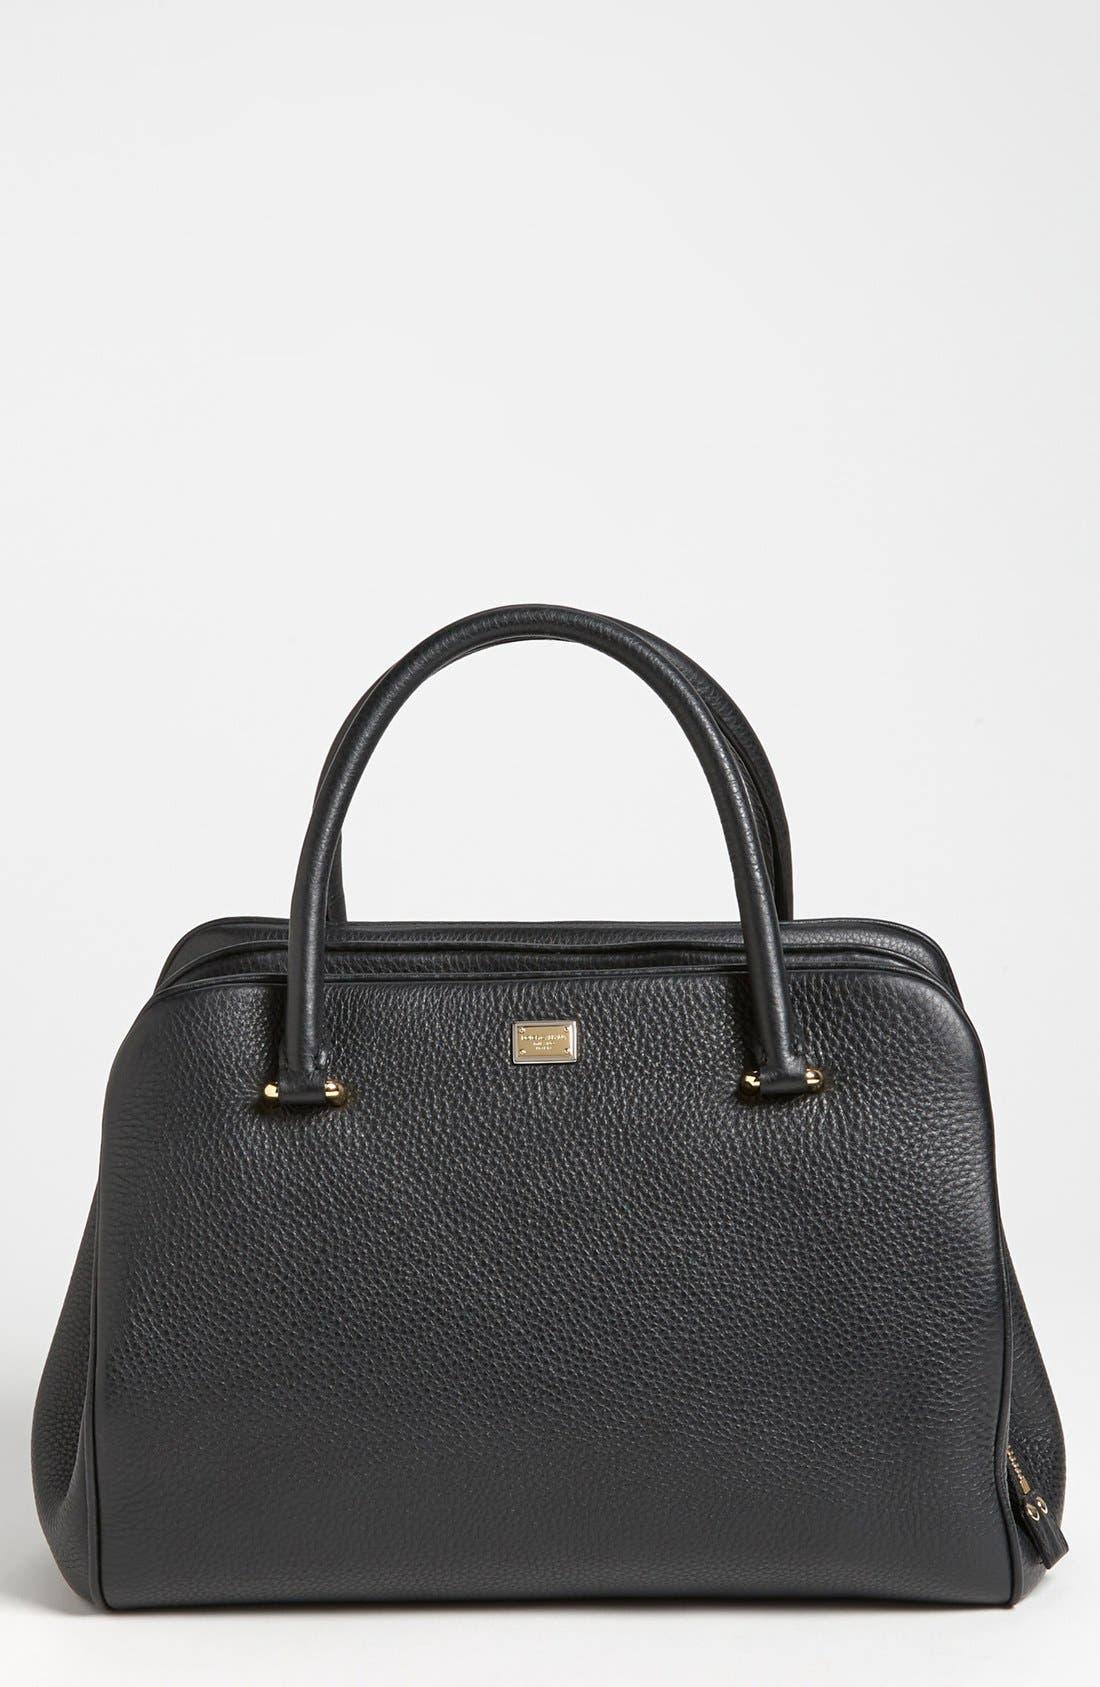 Main Image - Dolce&Gabbana 'Miss Lily' Leather Handbag